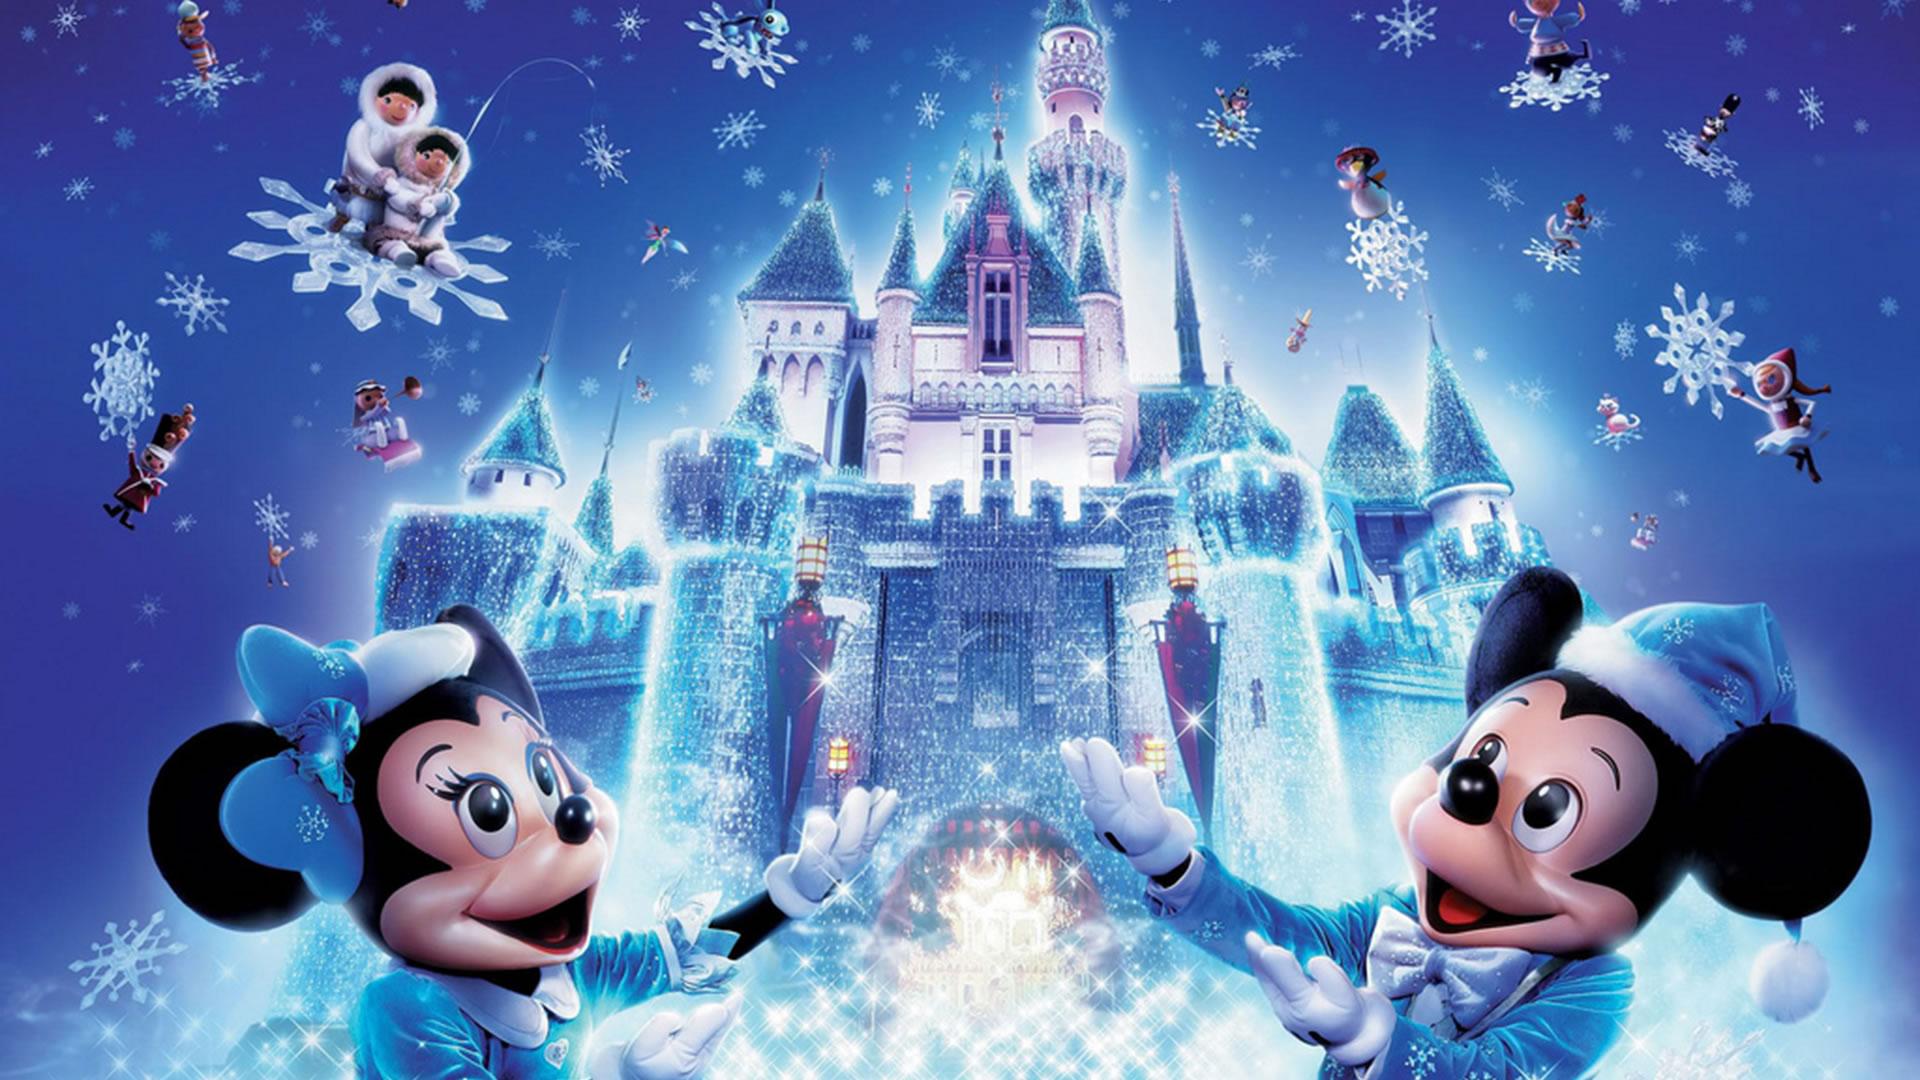 Disney HD Wallpapers 1920x1080